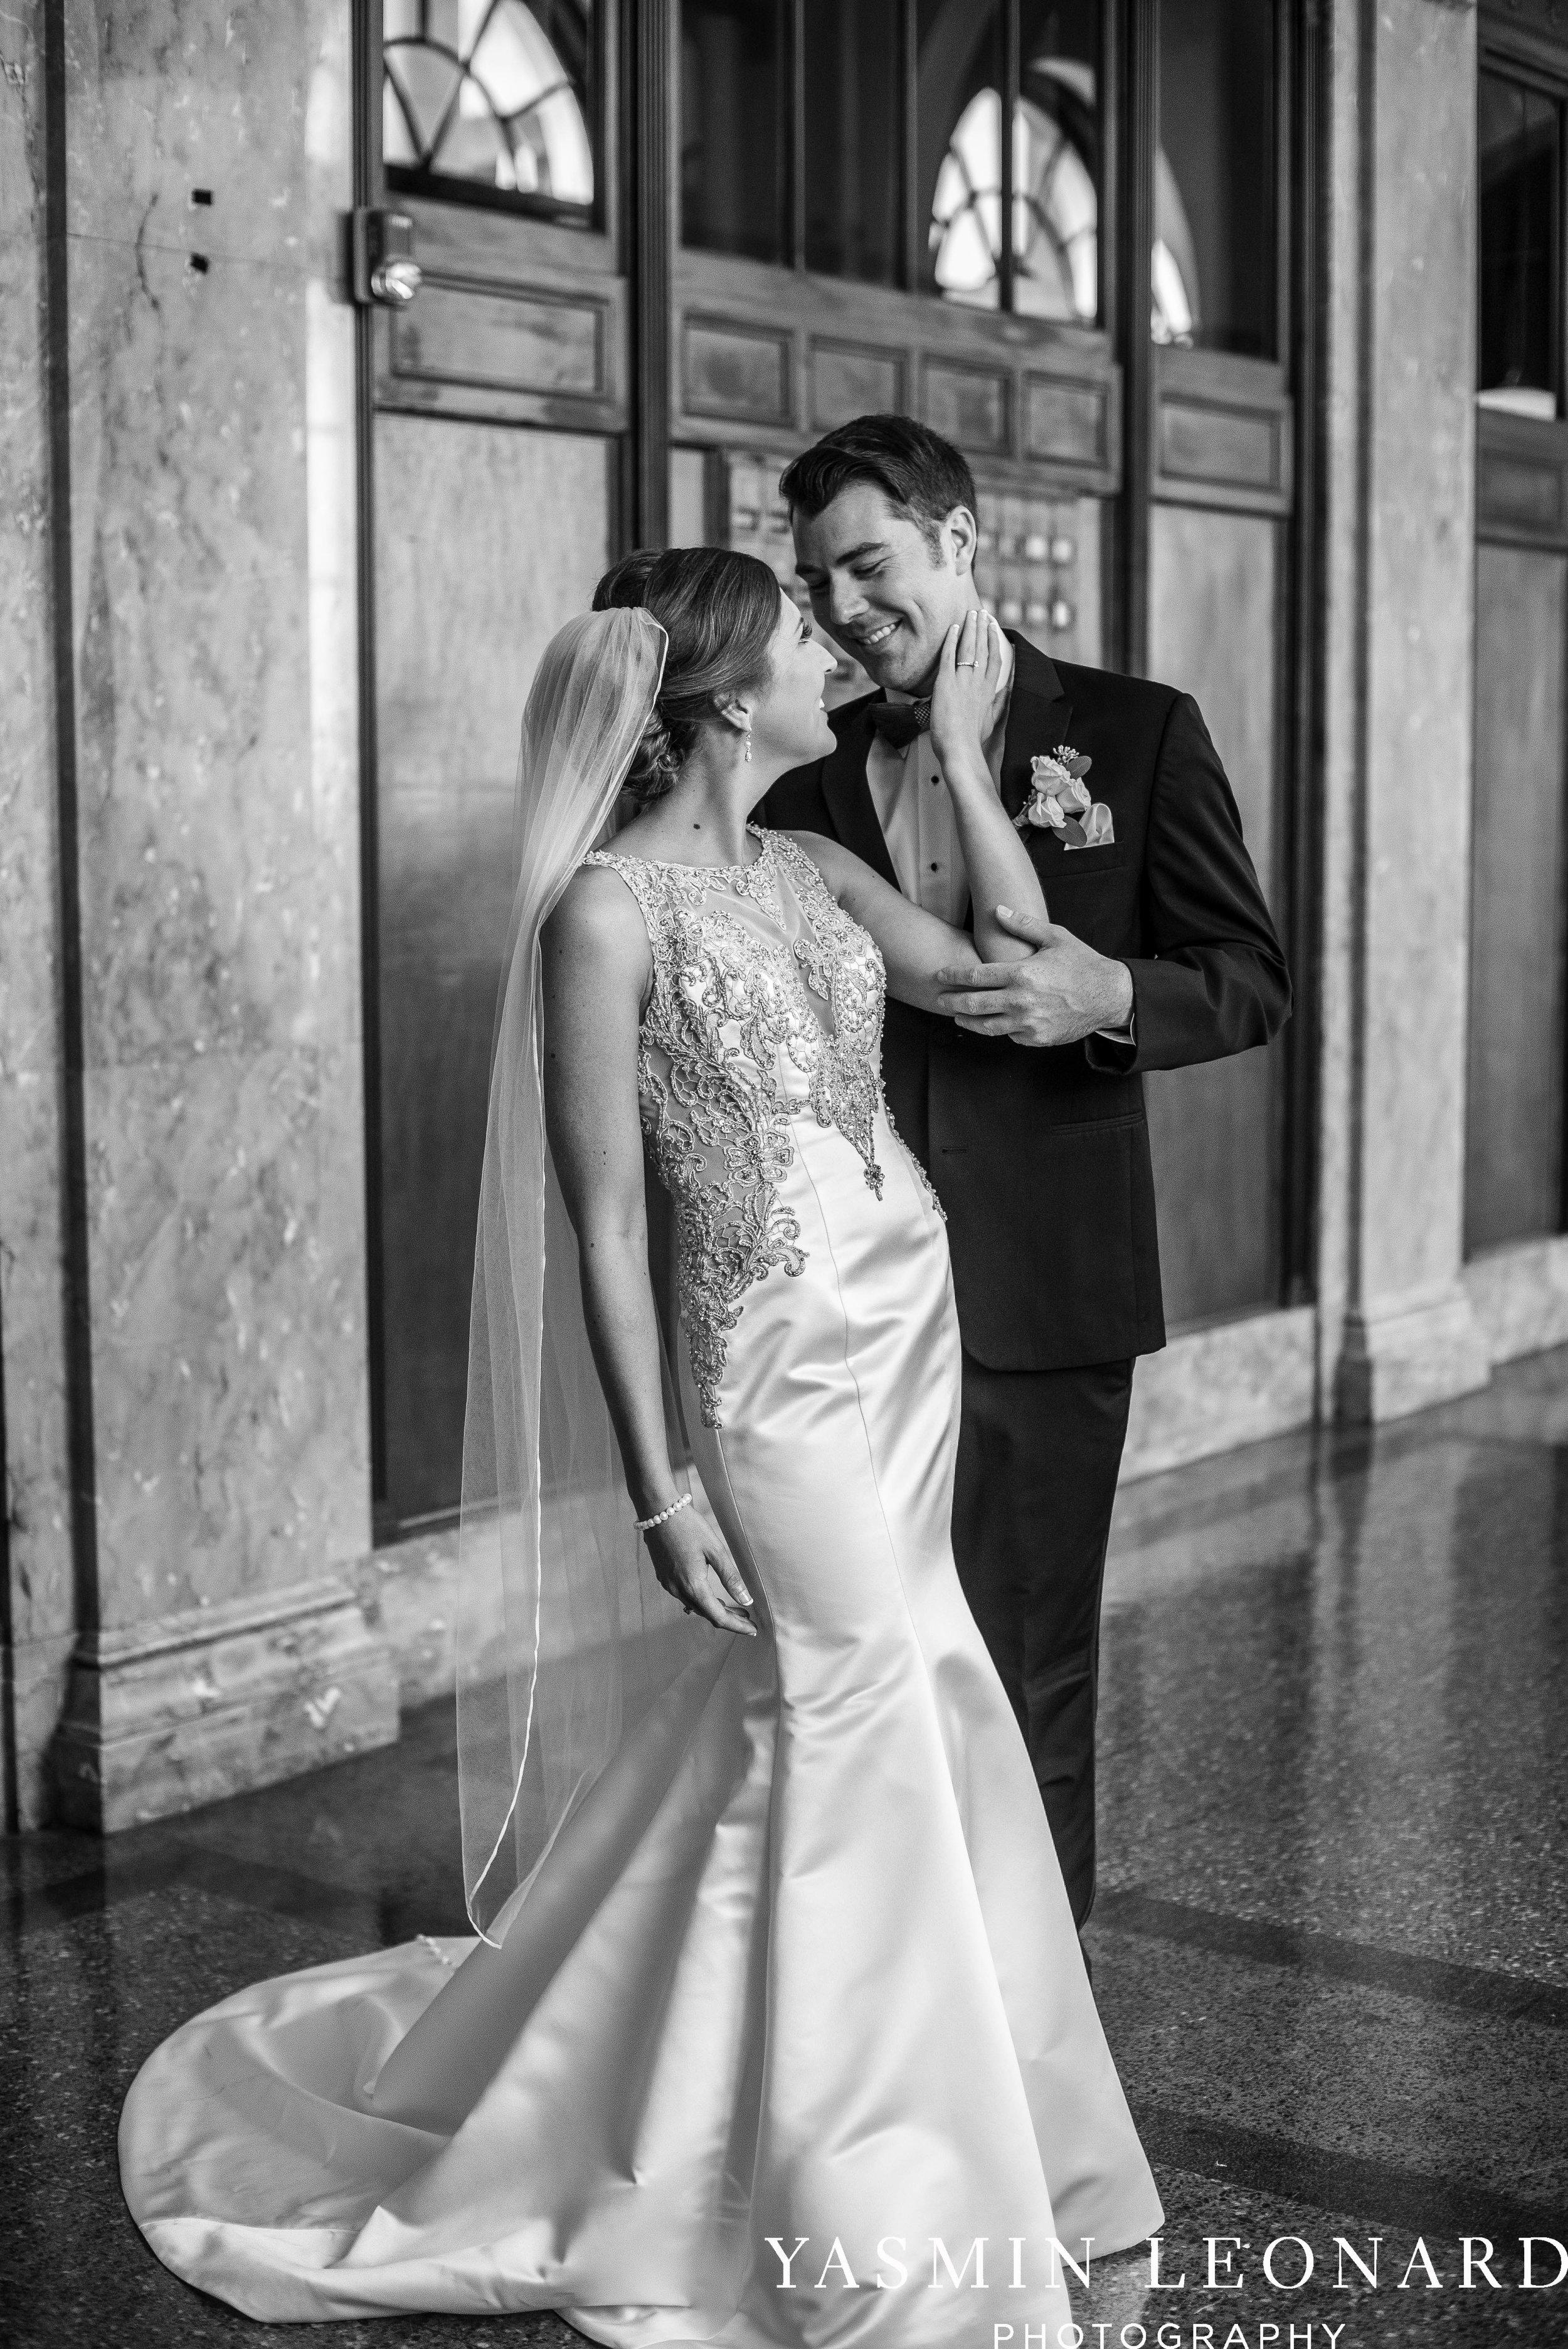 Millennium Center Wedding - Downtown Winston Salem - Winston Salem Wedding Photographer - Winston Salem Venues - Indoor Wedding Venues - NC Wedding Photographer - Yasmin Leonard Photography-25.jpg